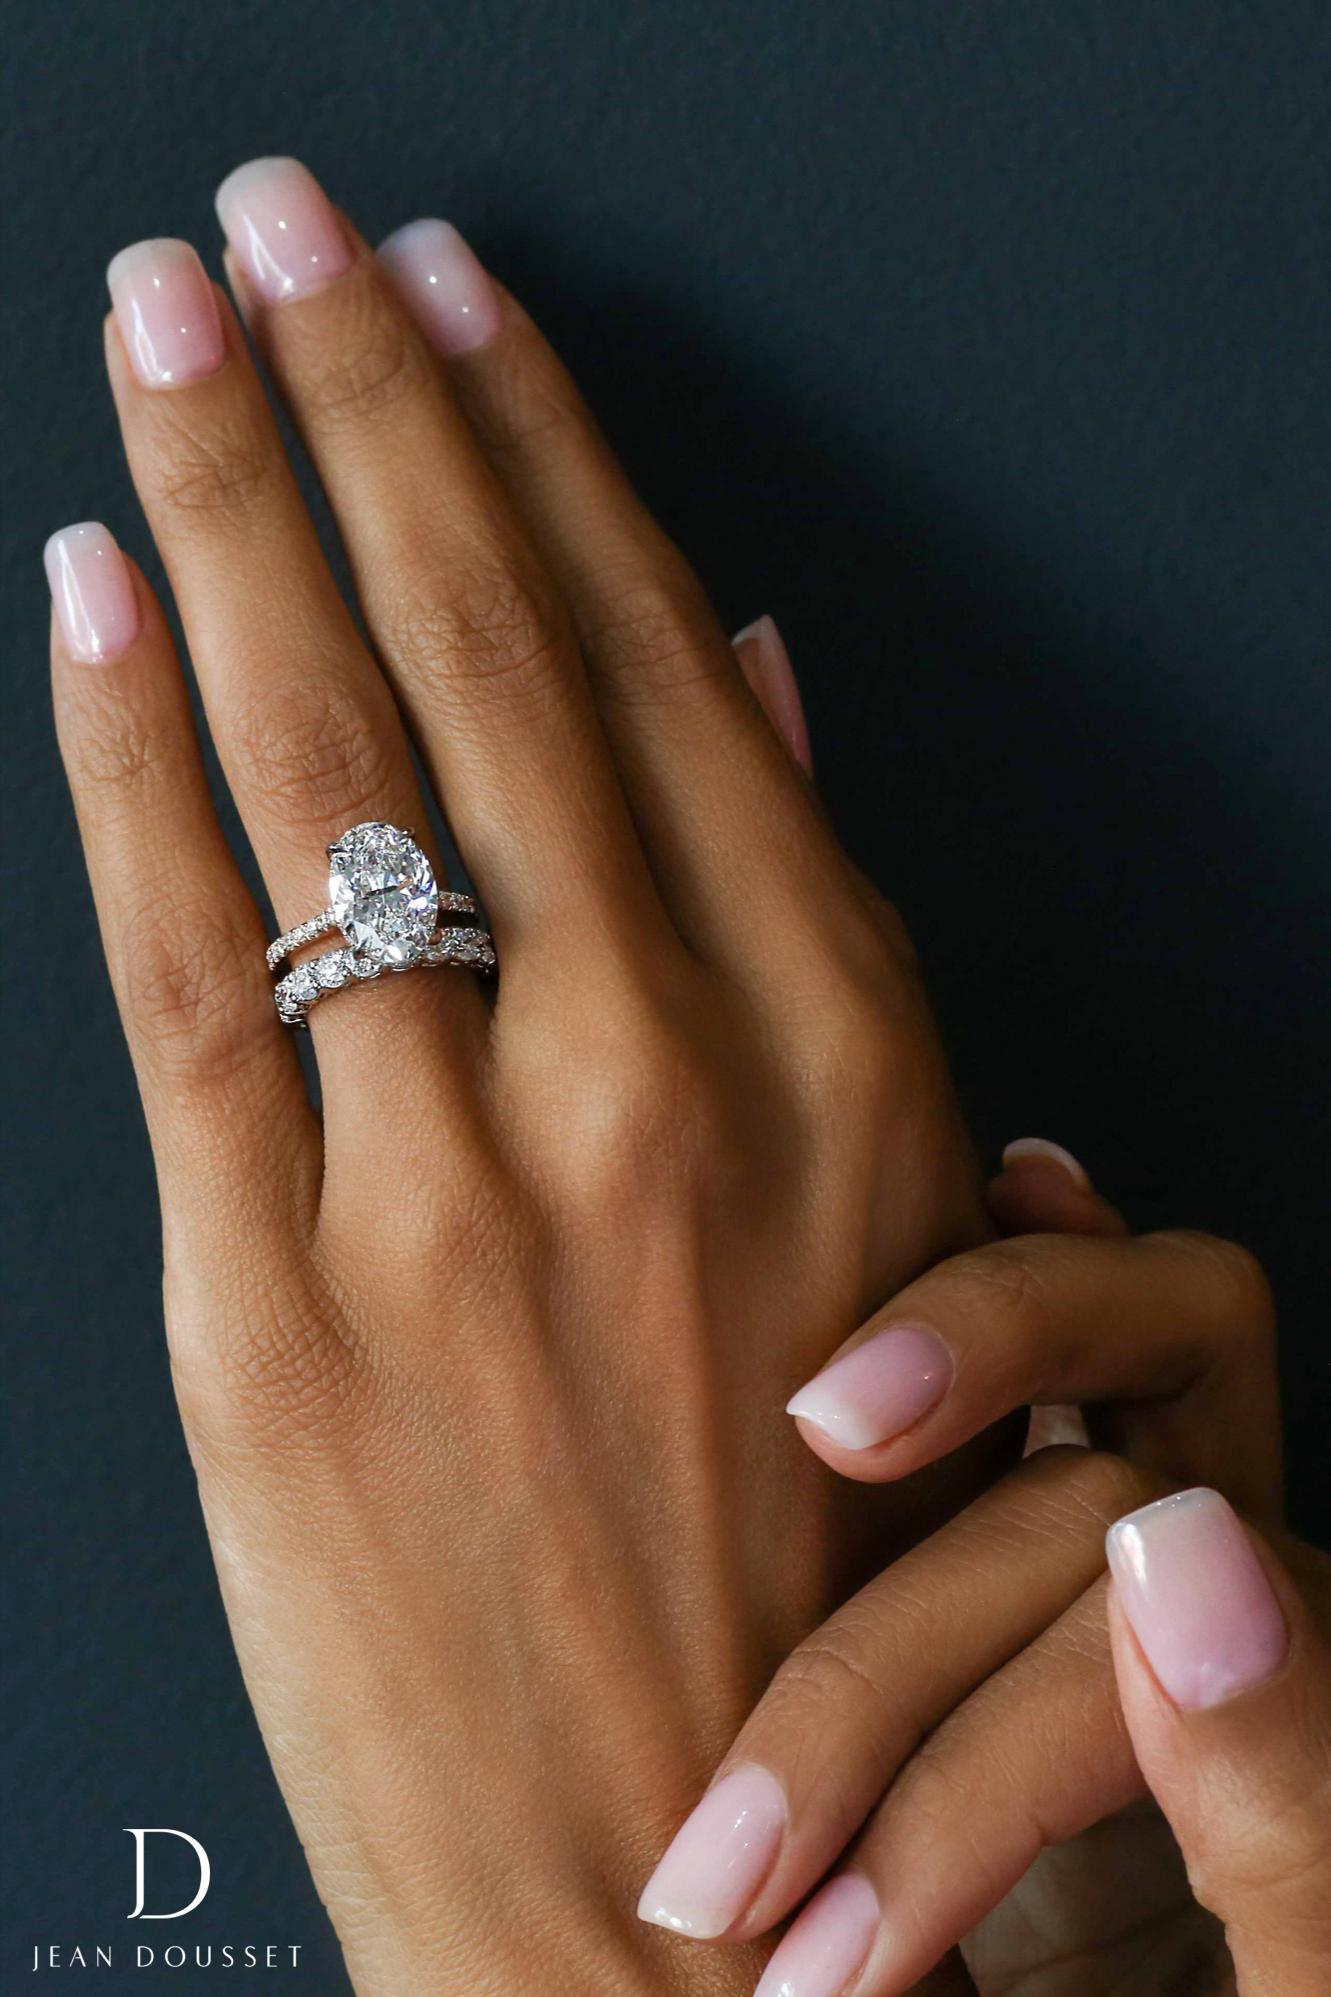 Unique Diamond Engagement Rings Vintageengagementrings Dream Engagement Rings Diamond Wedding Rings Unique Engagement Rings